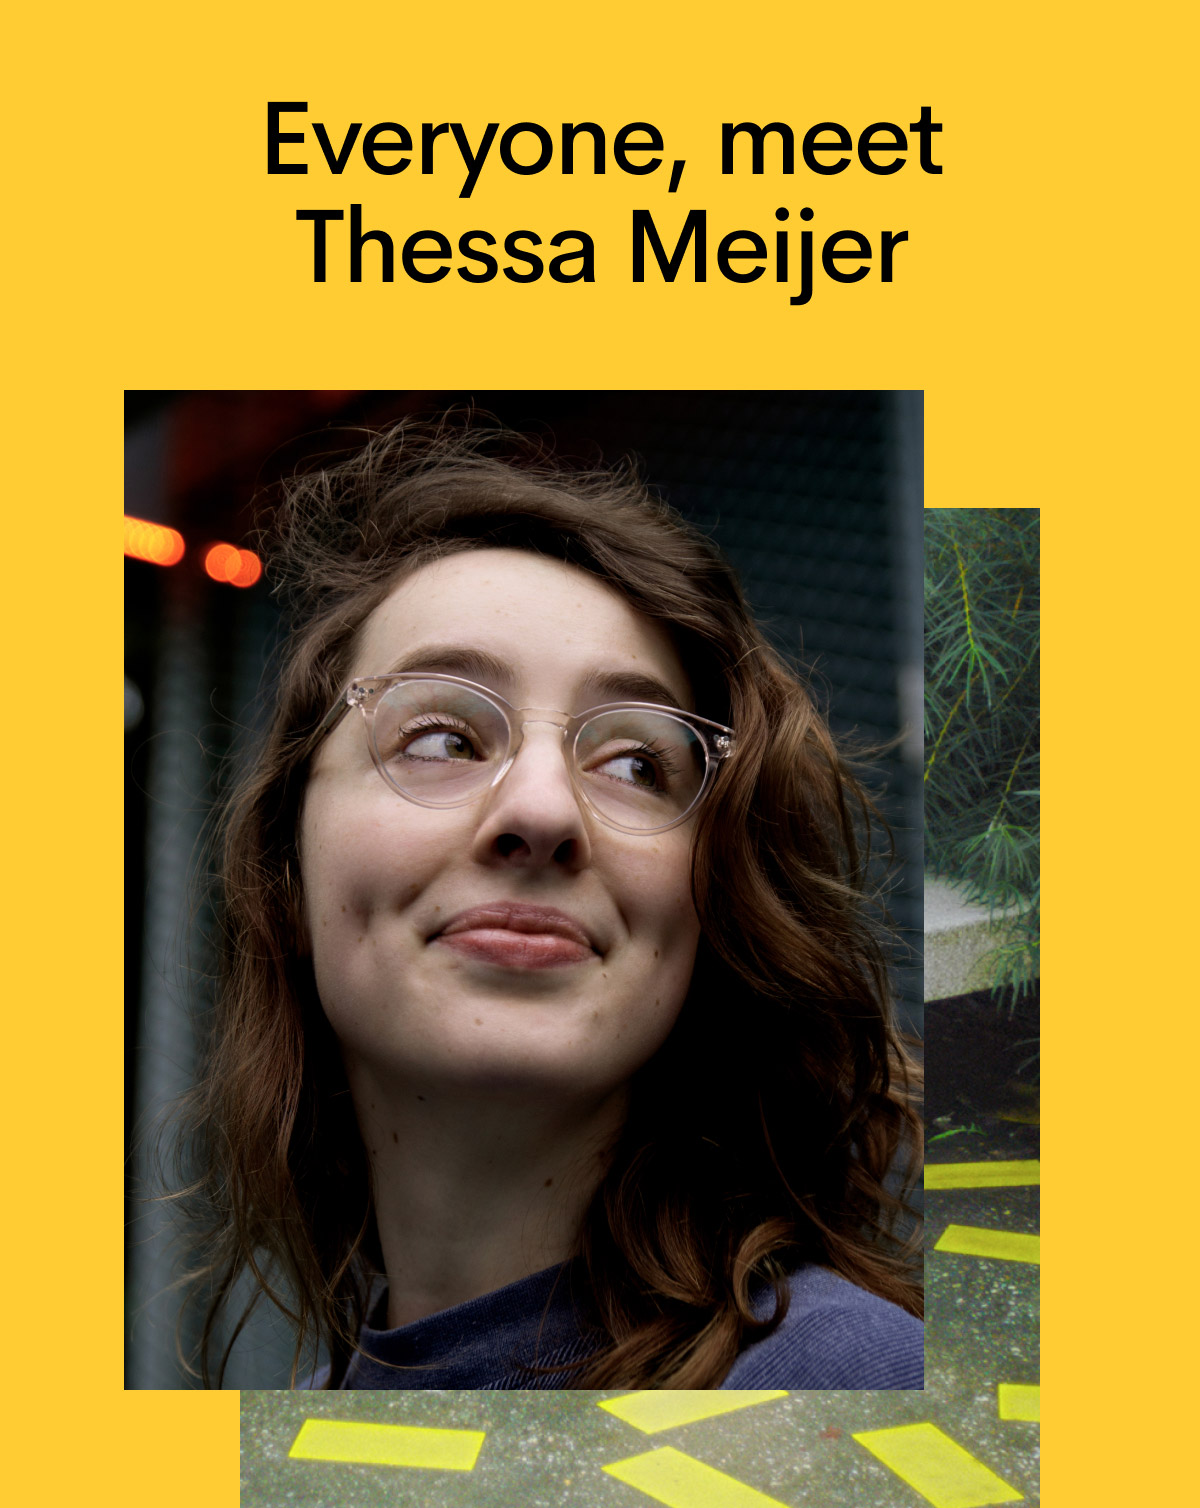 Everyone, meet Thessa Meijer.